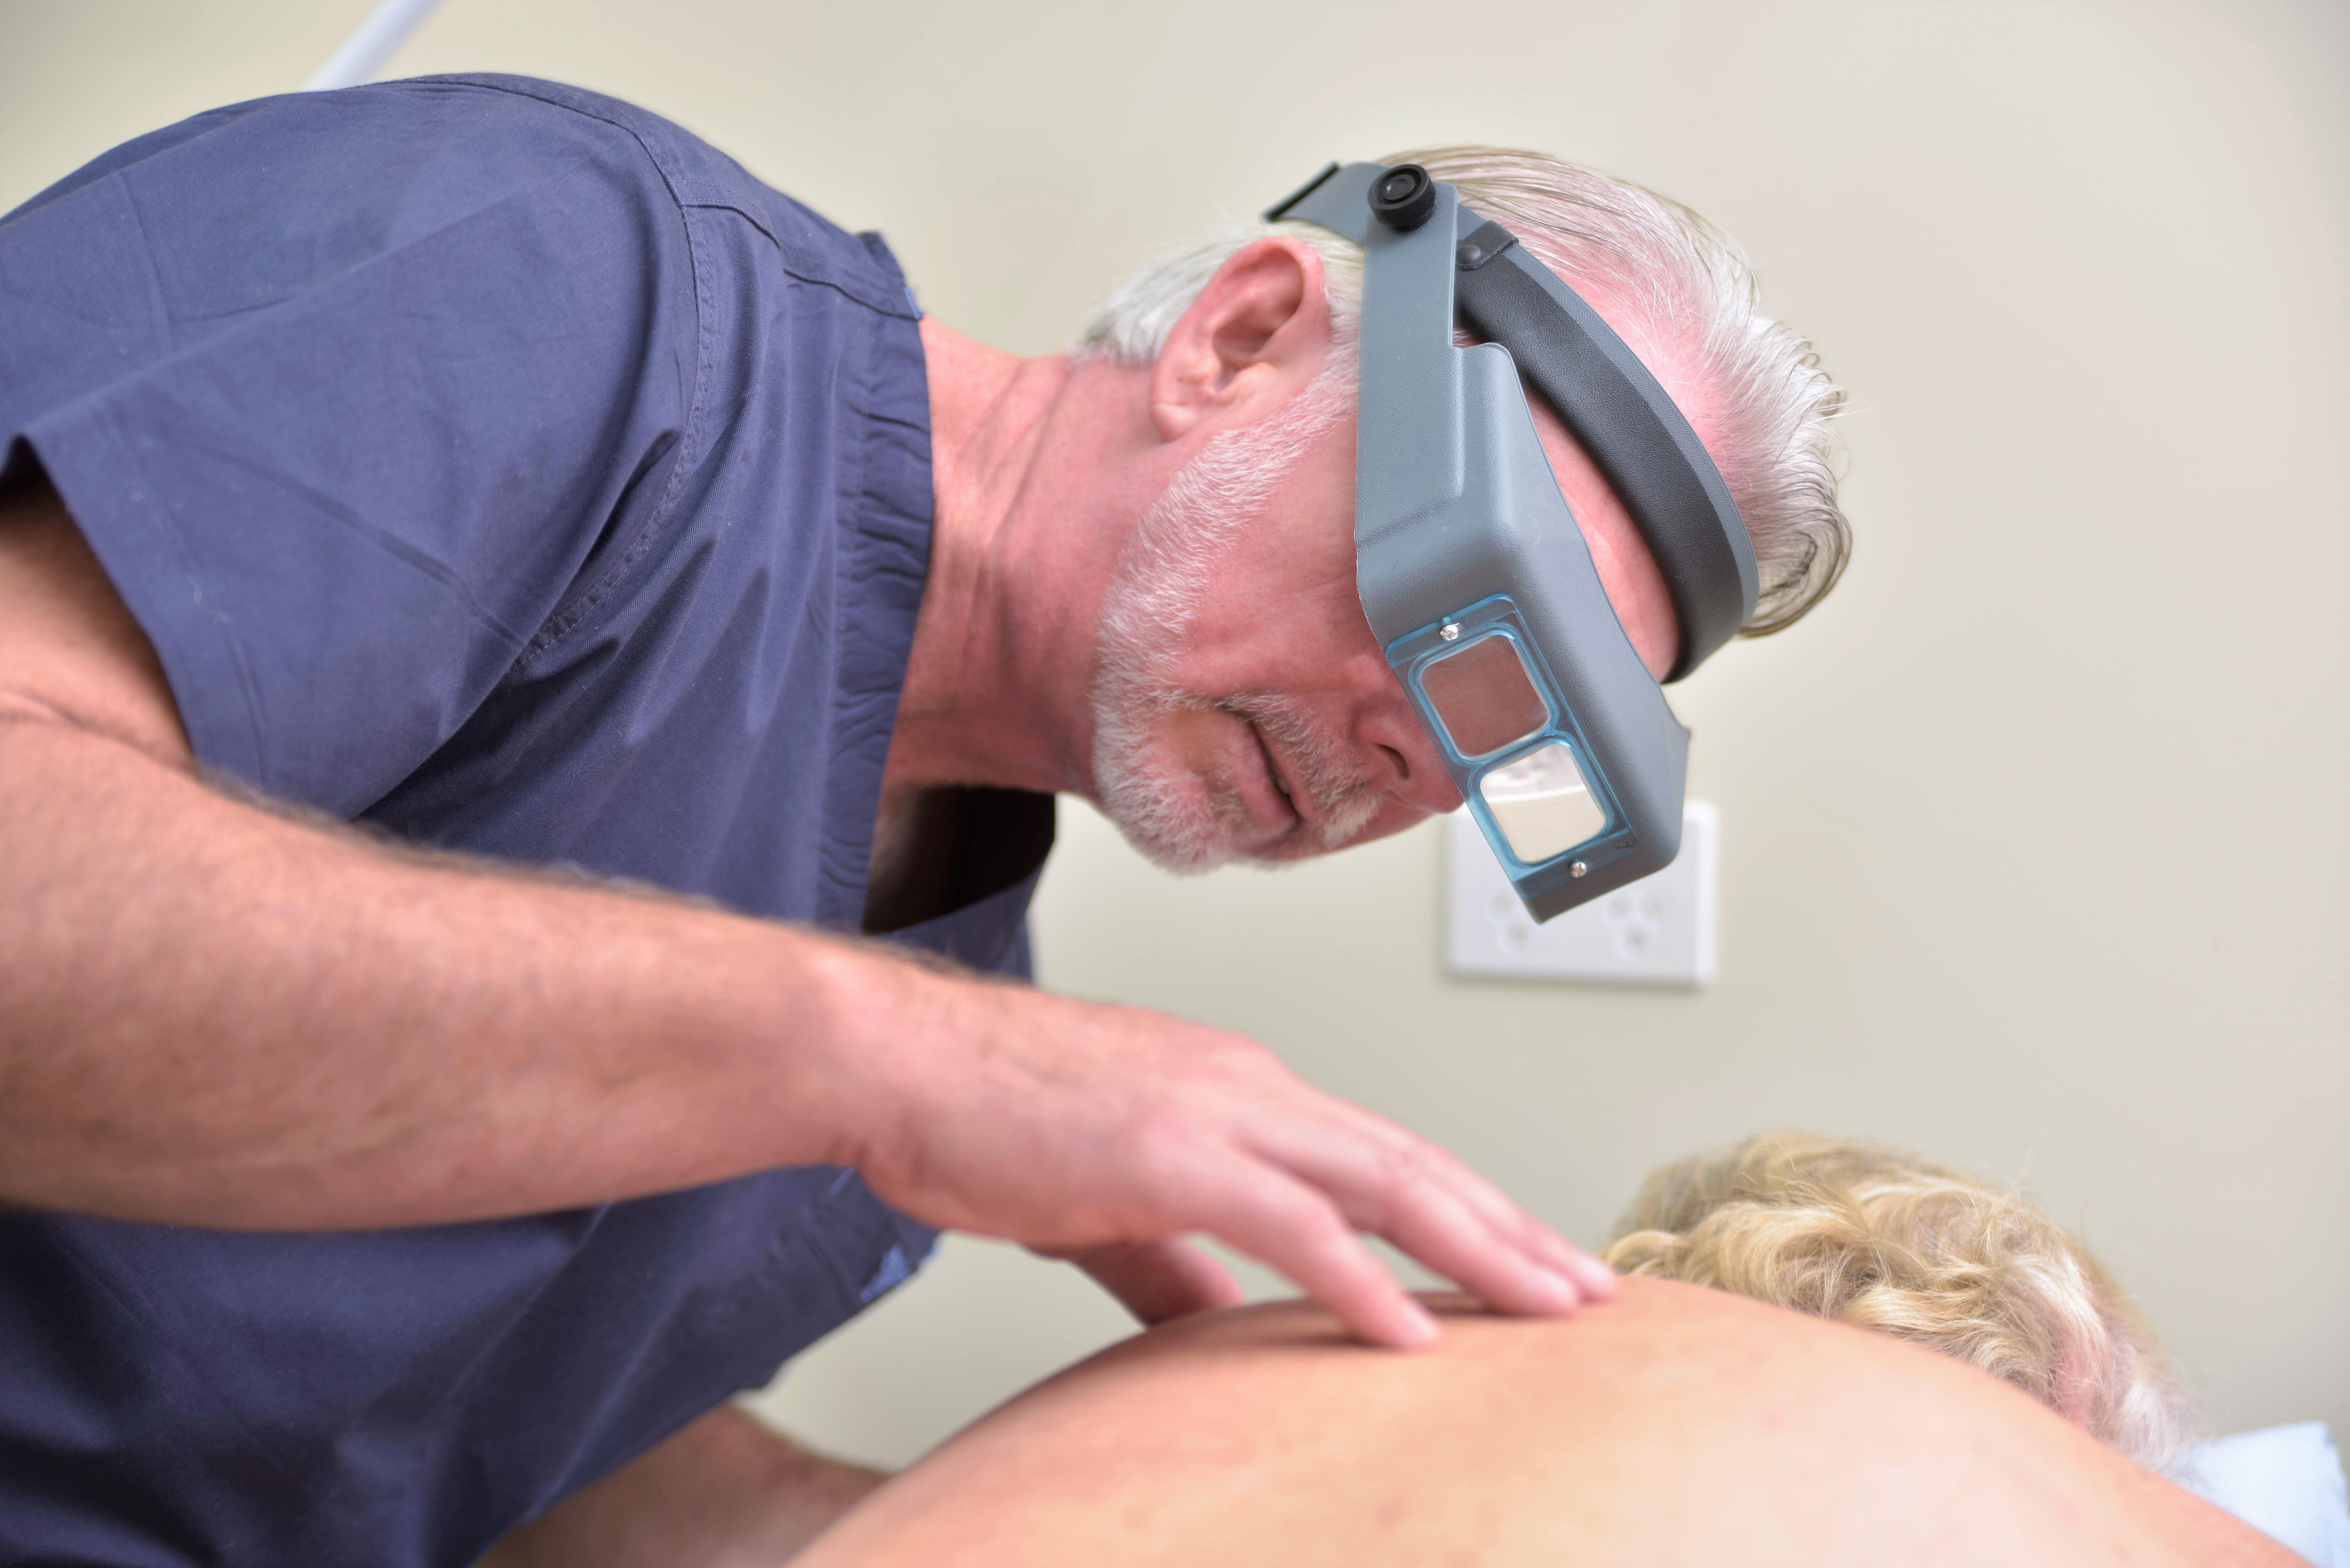 Full-body skin check